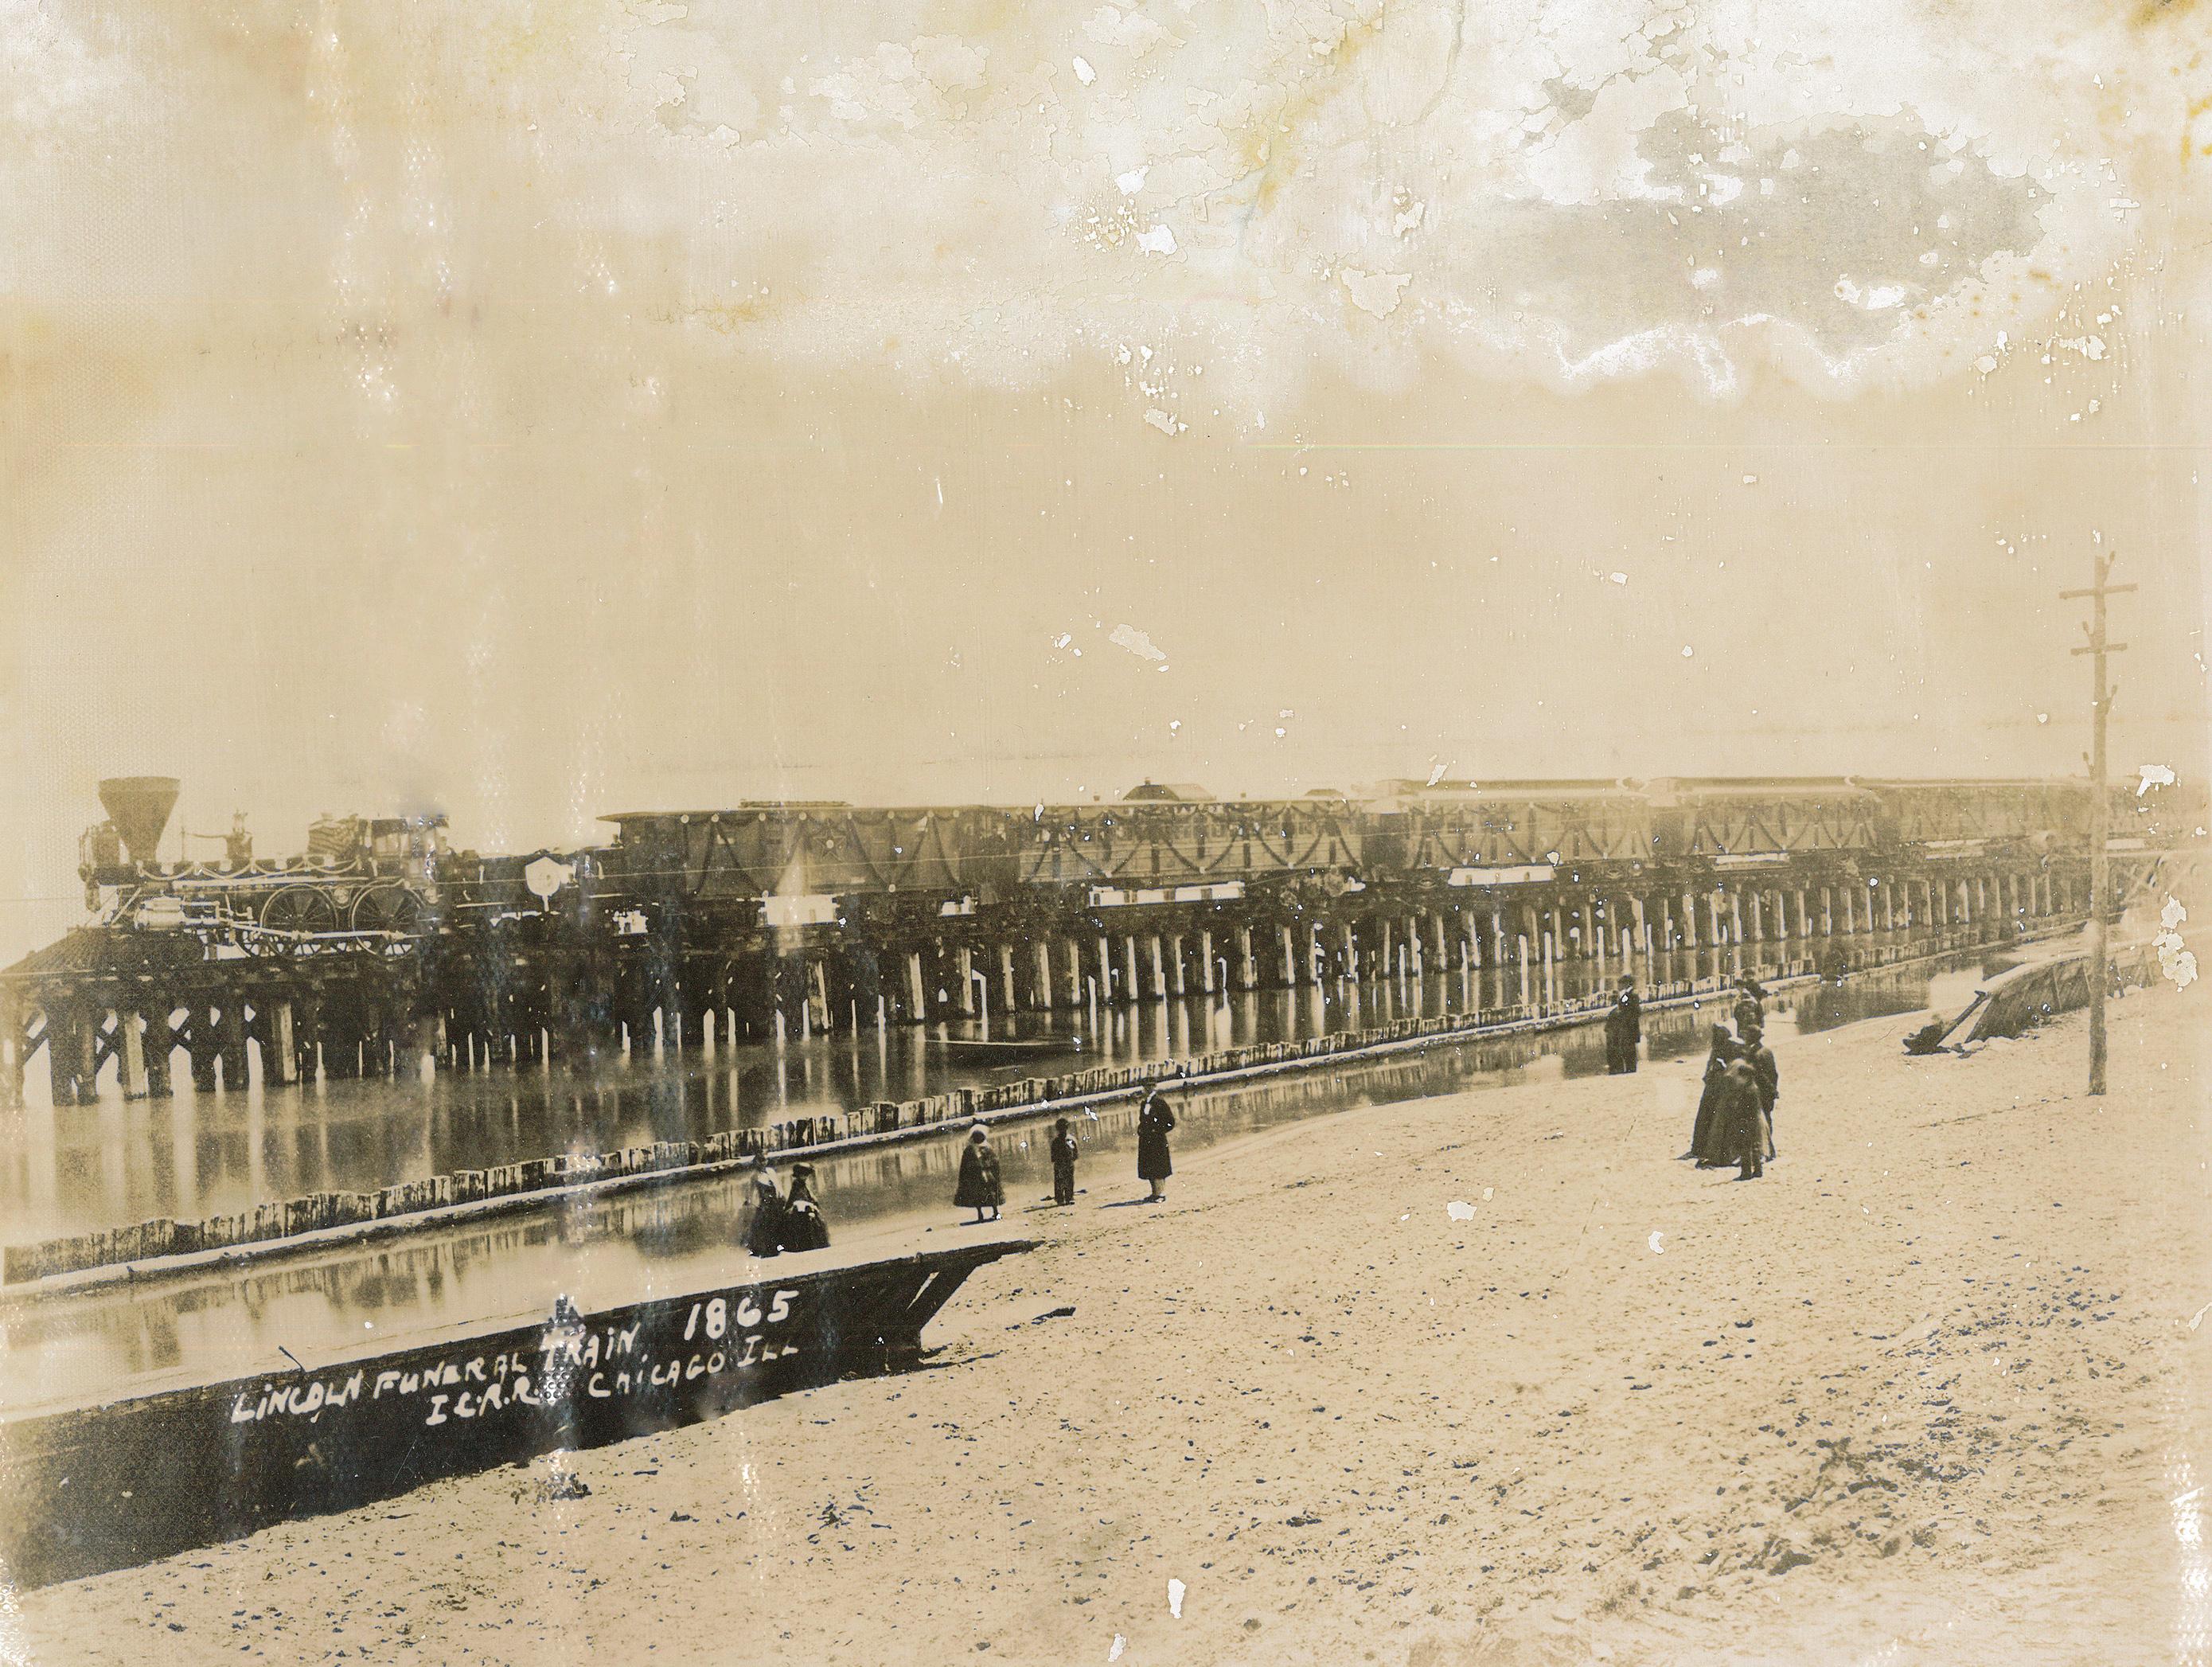 Photograph – Lincoln Funeral Train